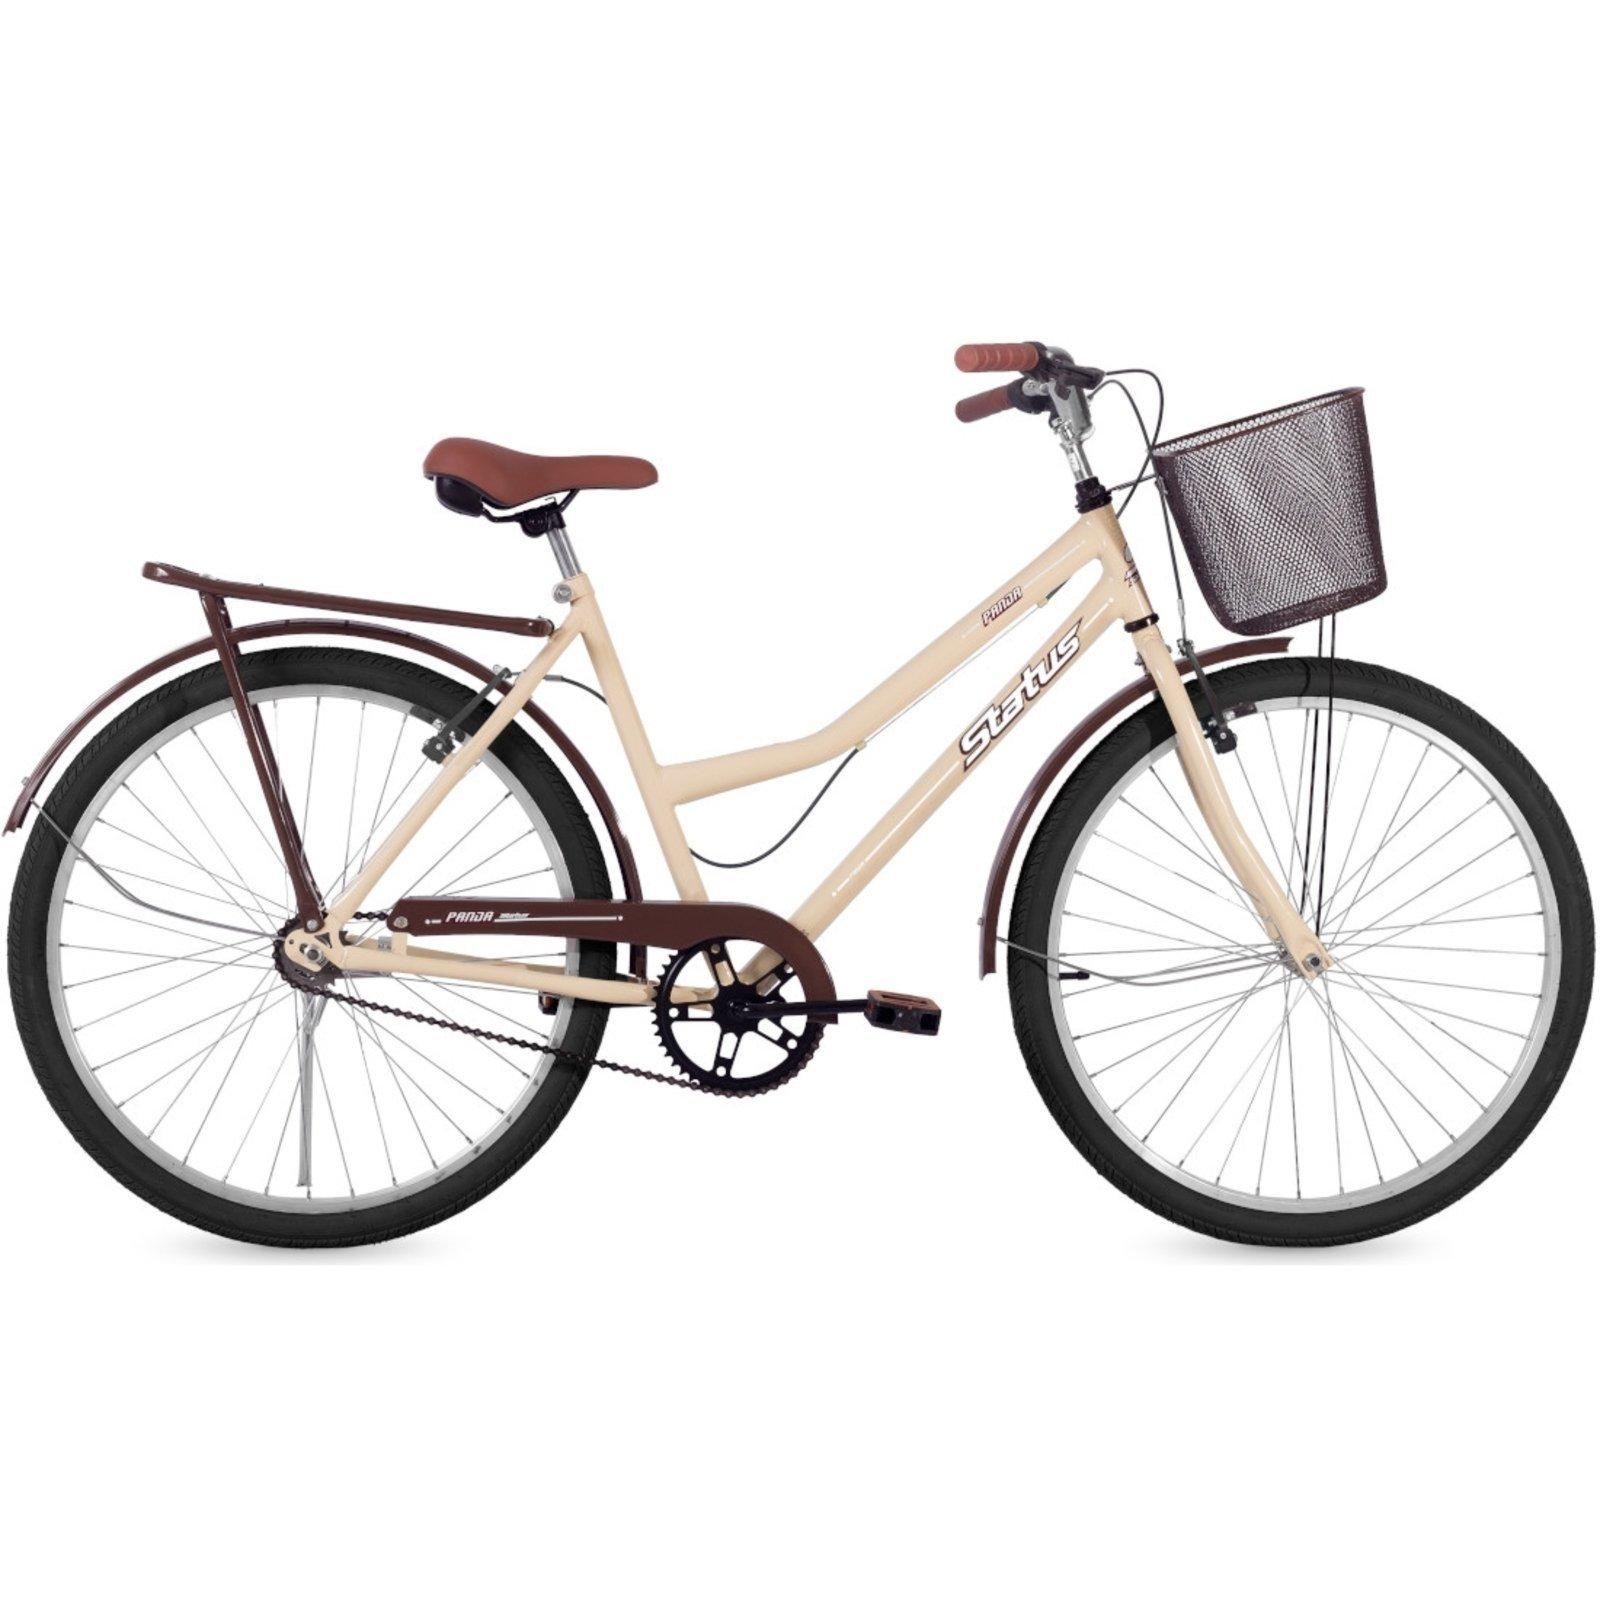 Bicicleta Mobele Bikes Vintage Retrô Aro 26 Rígida 1 Marcha - Bege